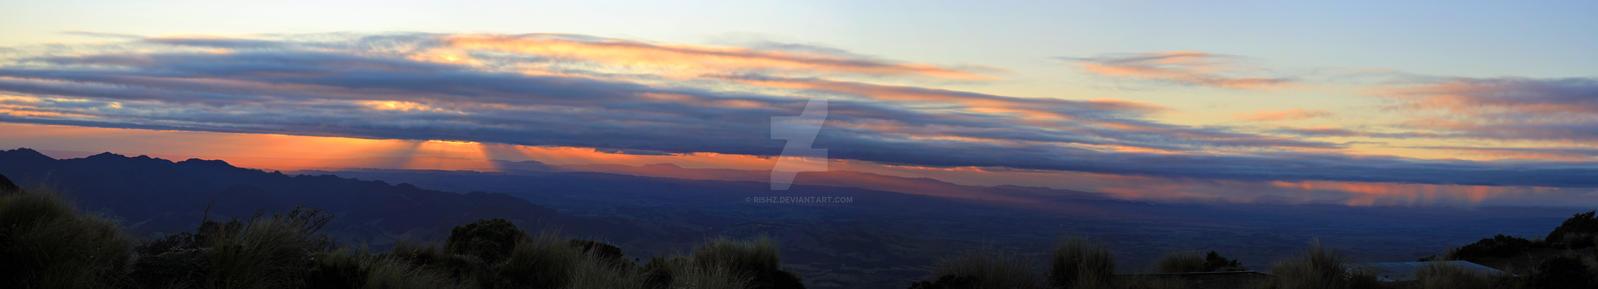 Sunrise from Sunrise Hut, Ruahines by RishZ